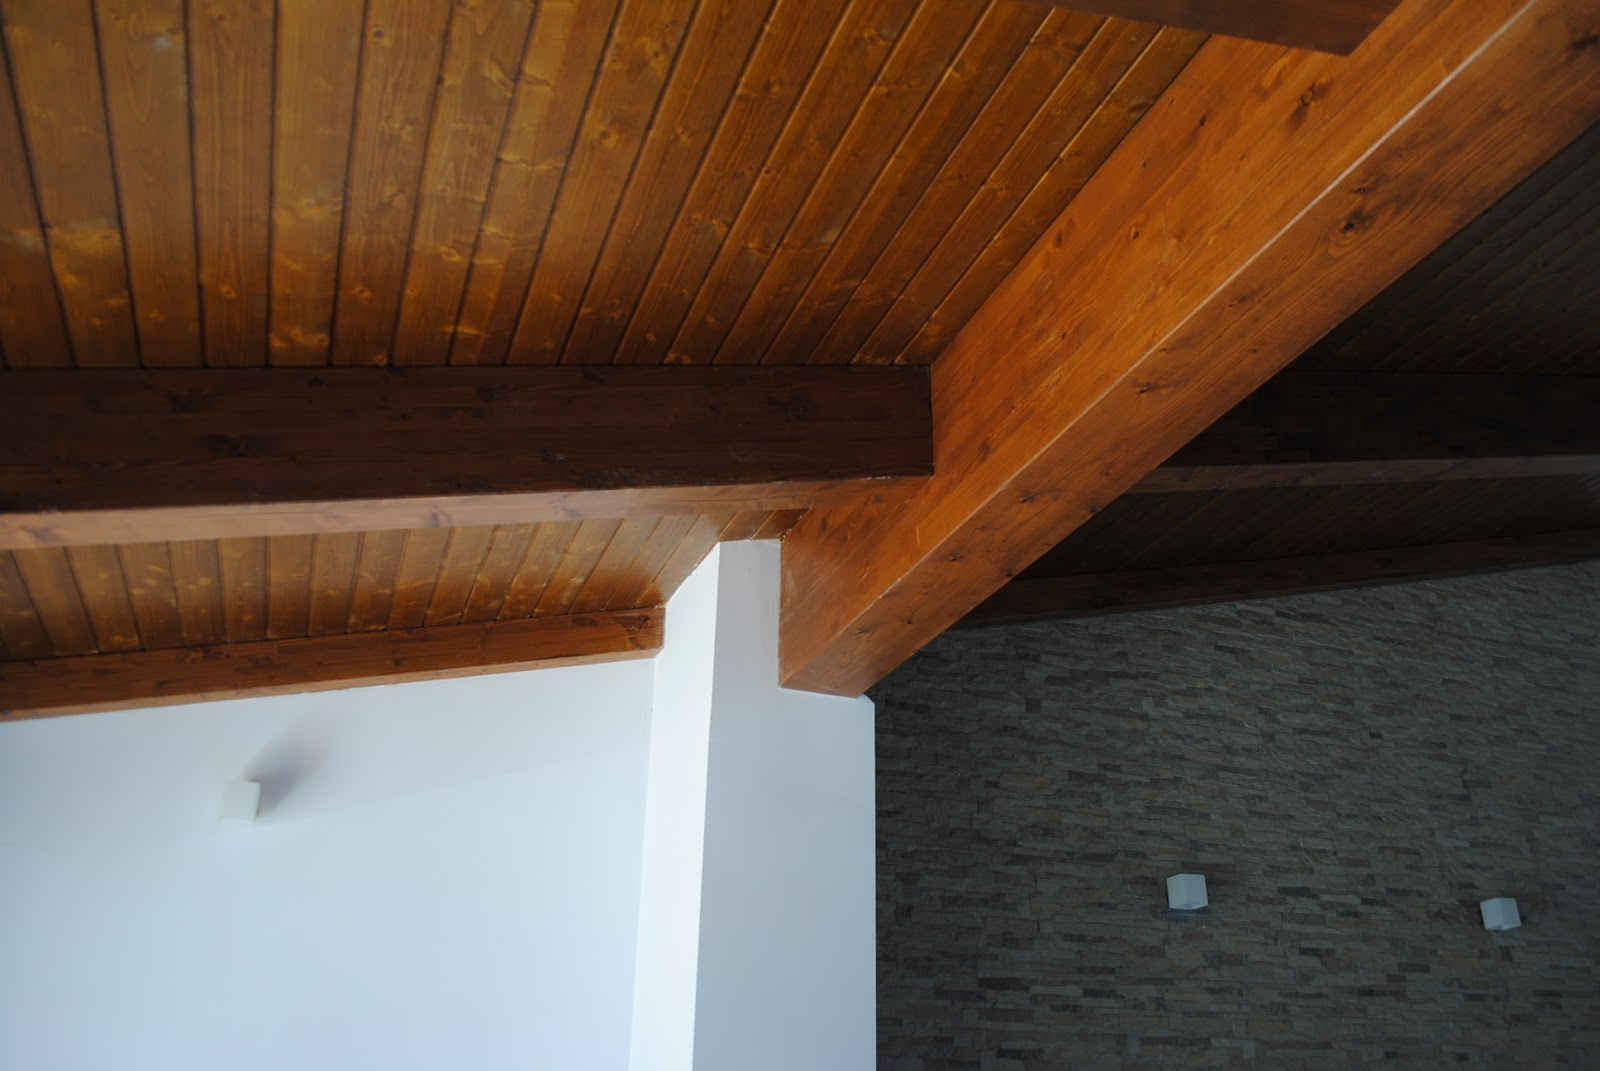 Estructuras de madera cutecma junio 2013 for Tejados madera ourense